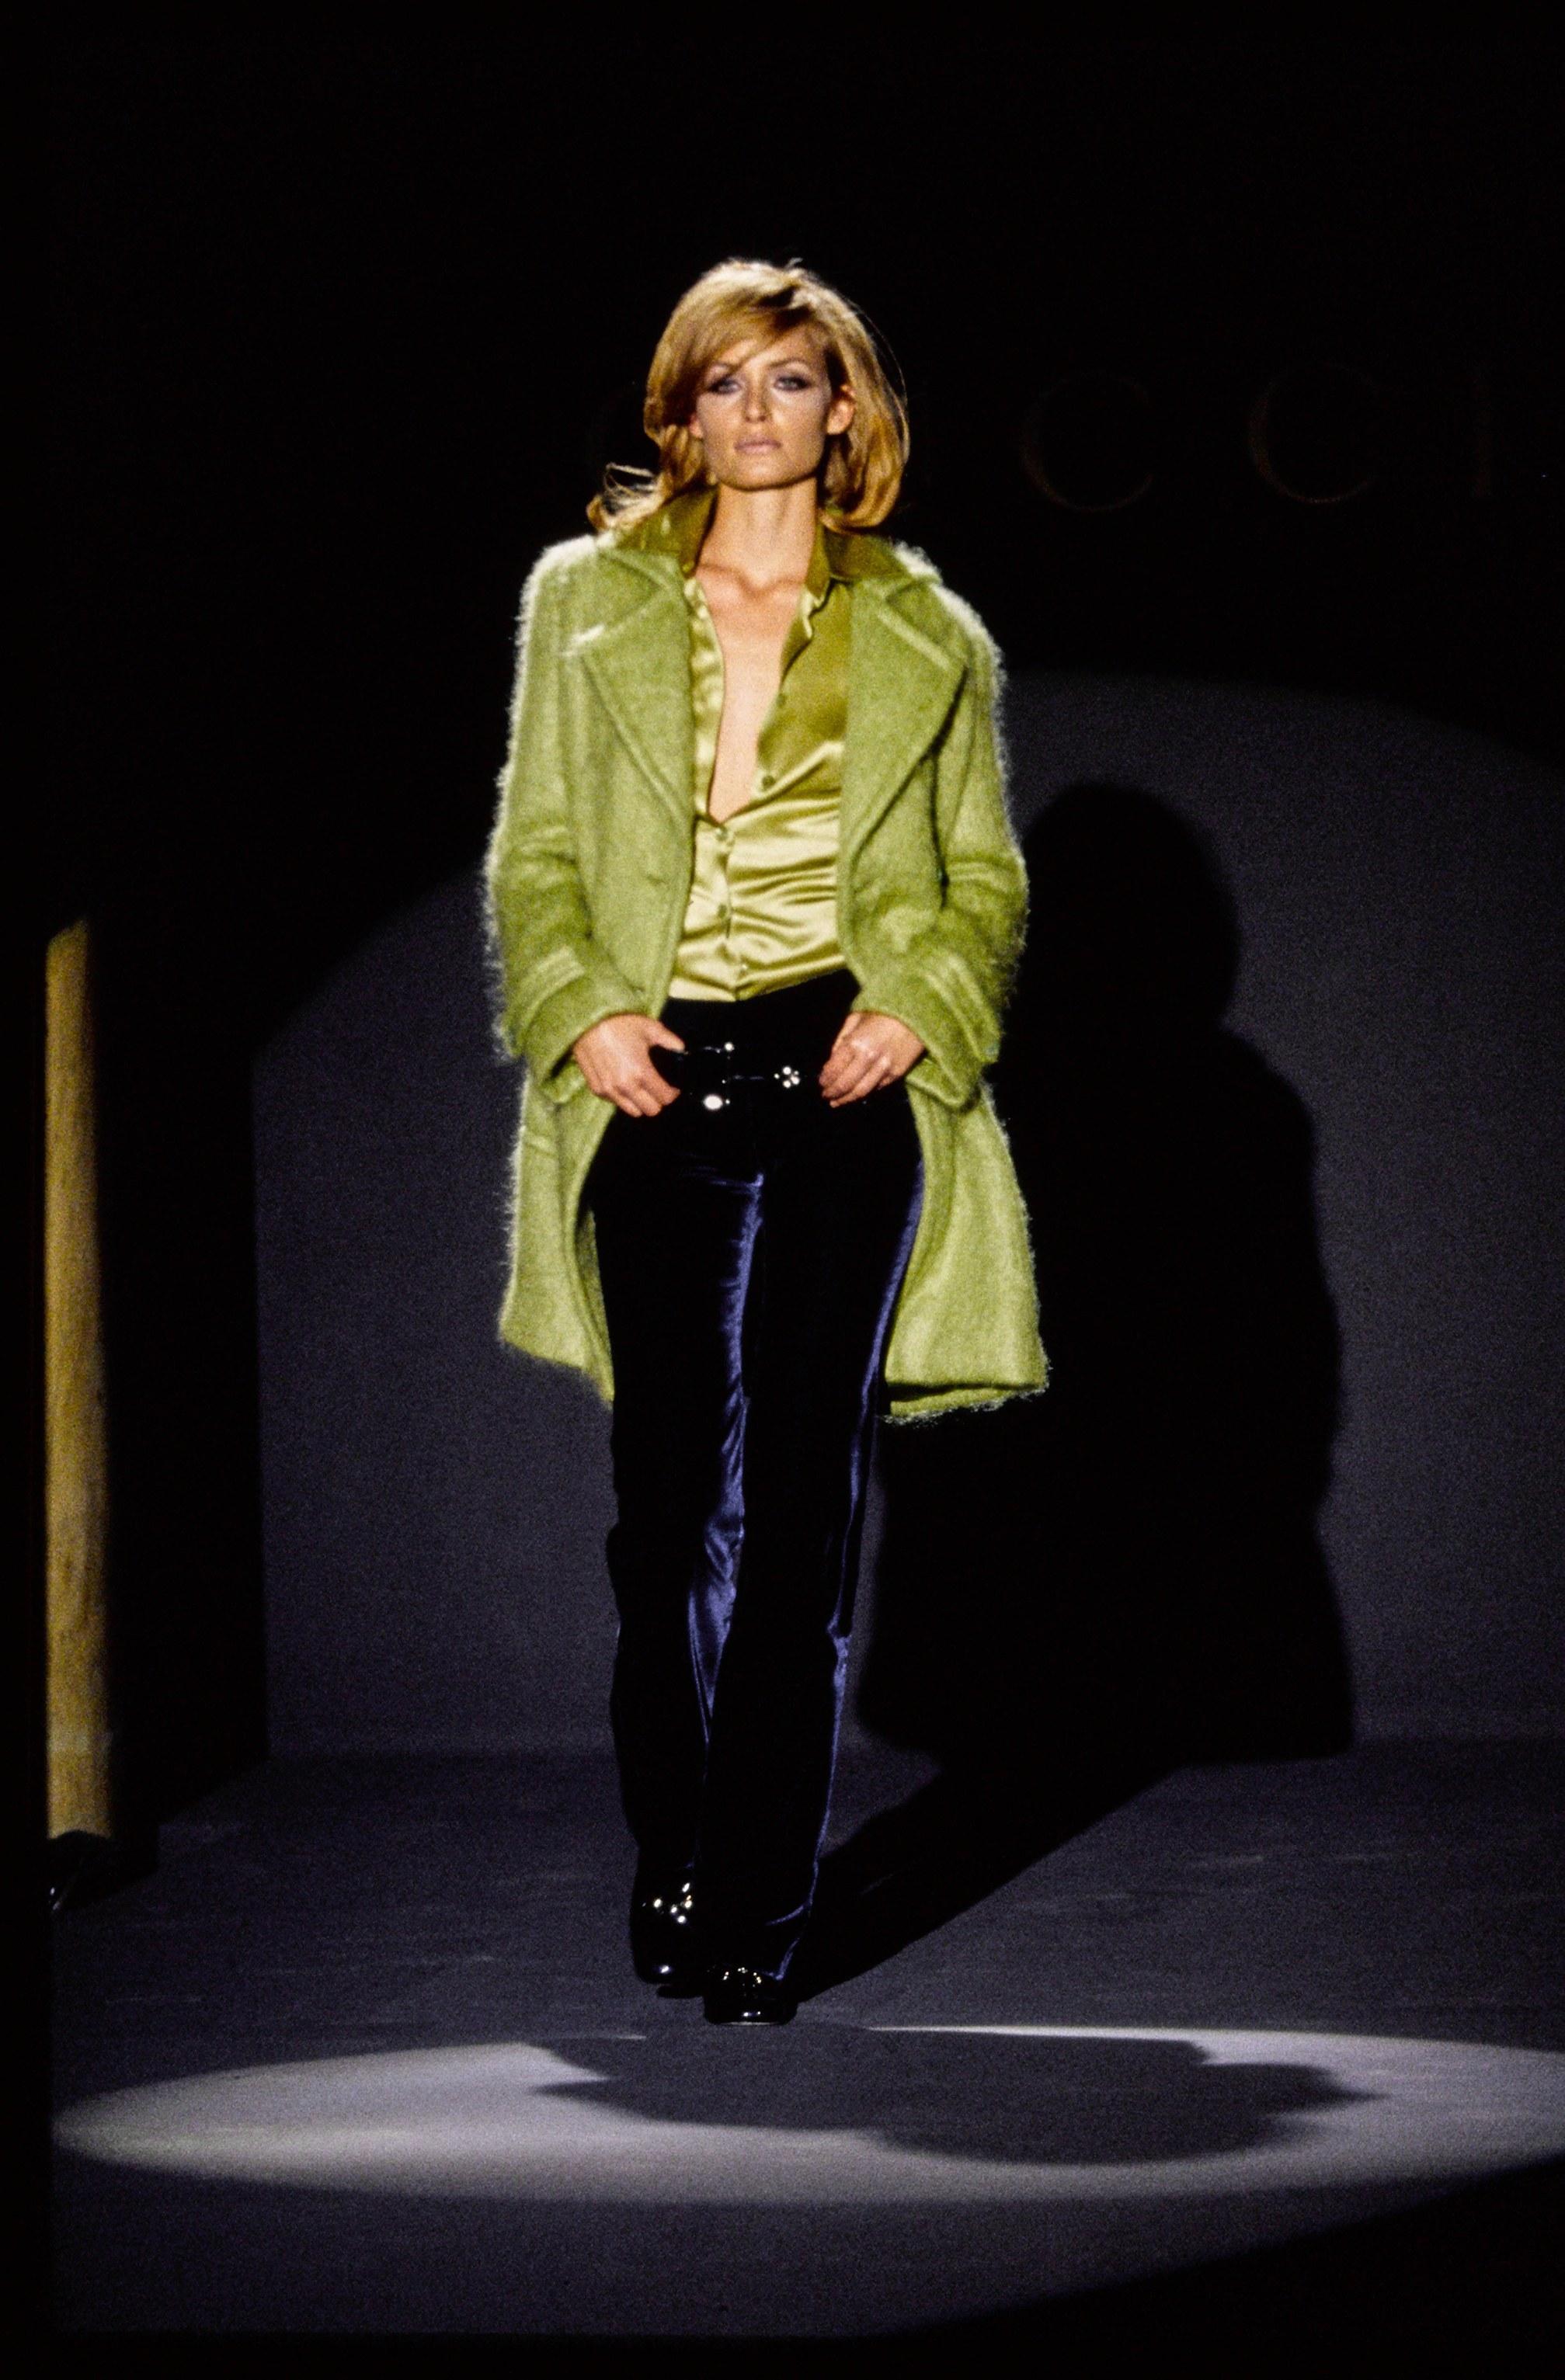 Bamboo Bag Gucci Autunno Inverno 1995-96 2d6b9c878ec